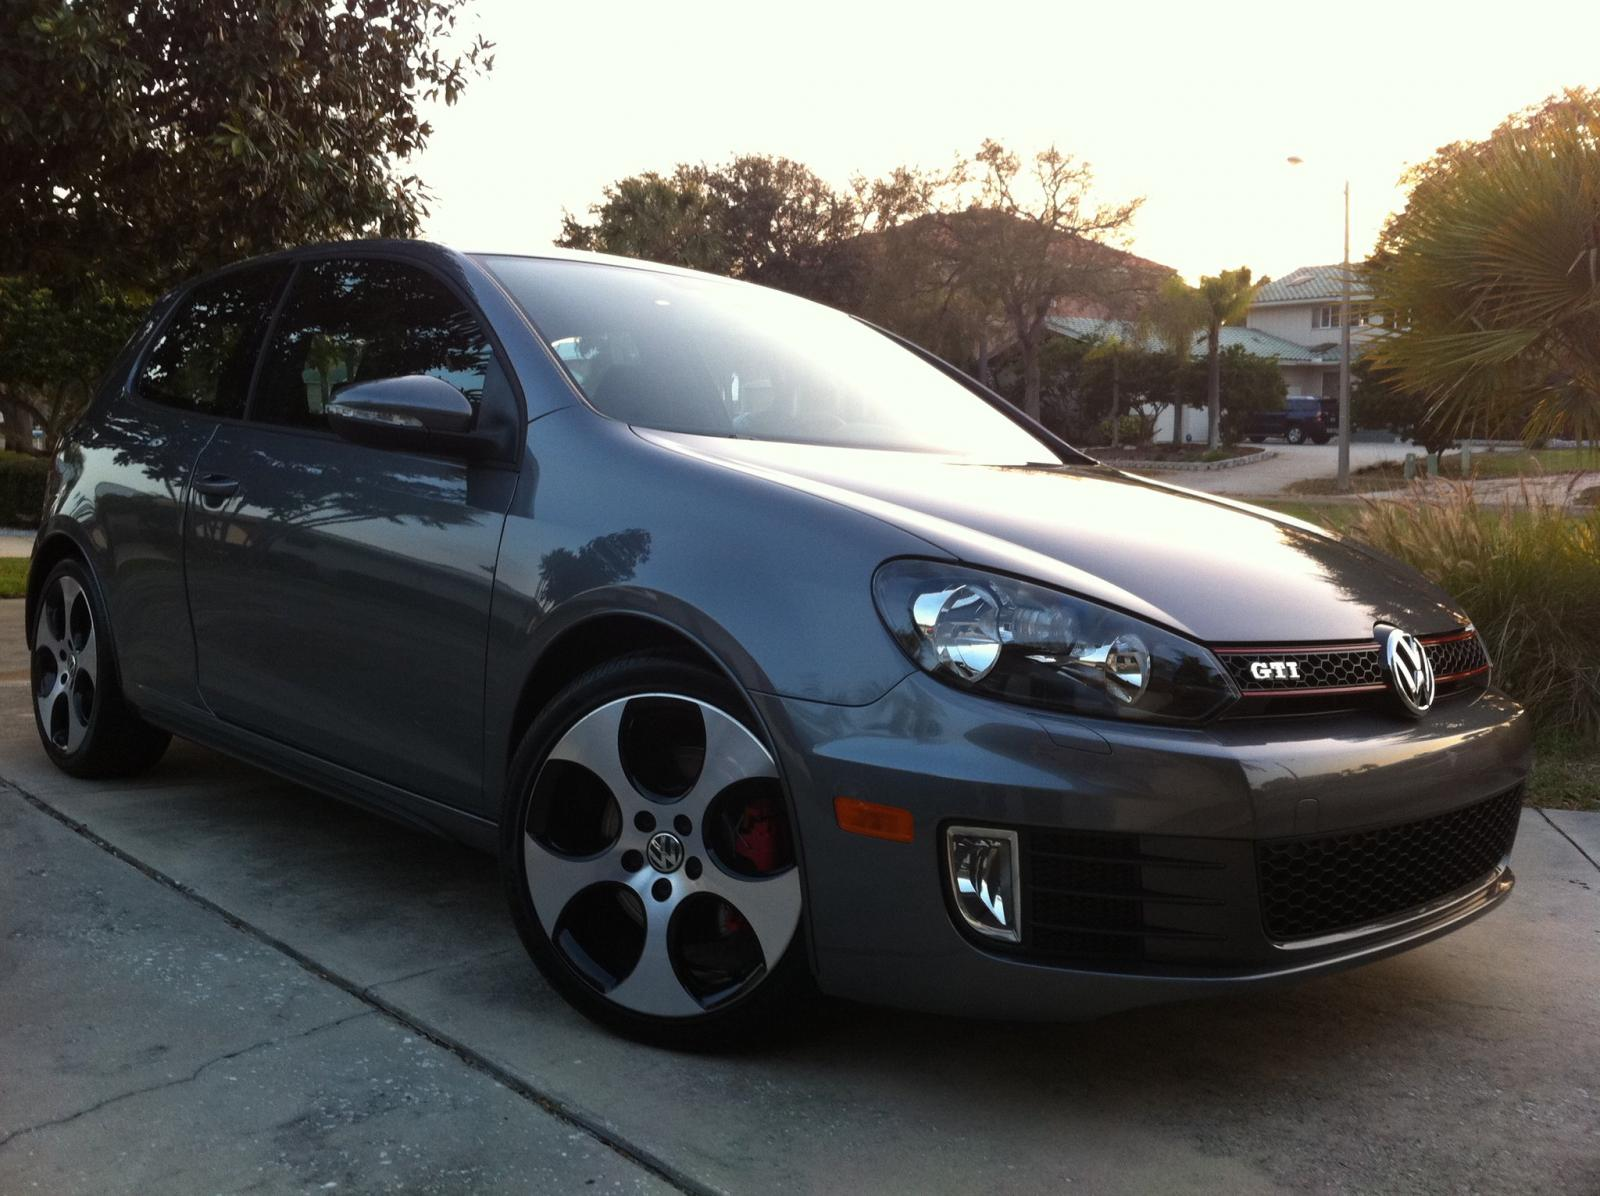 My new GTI!